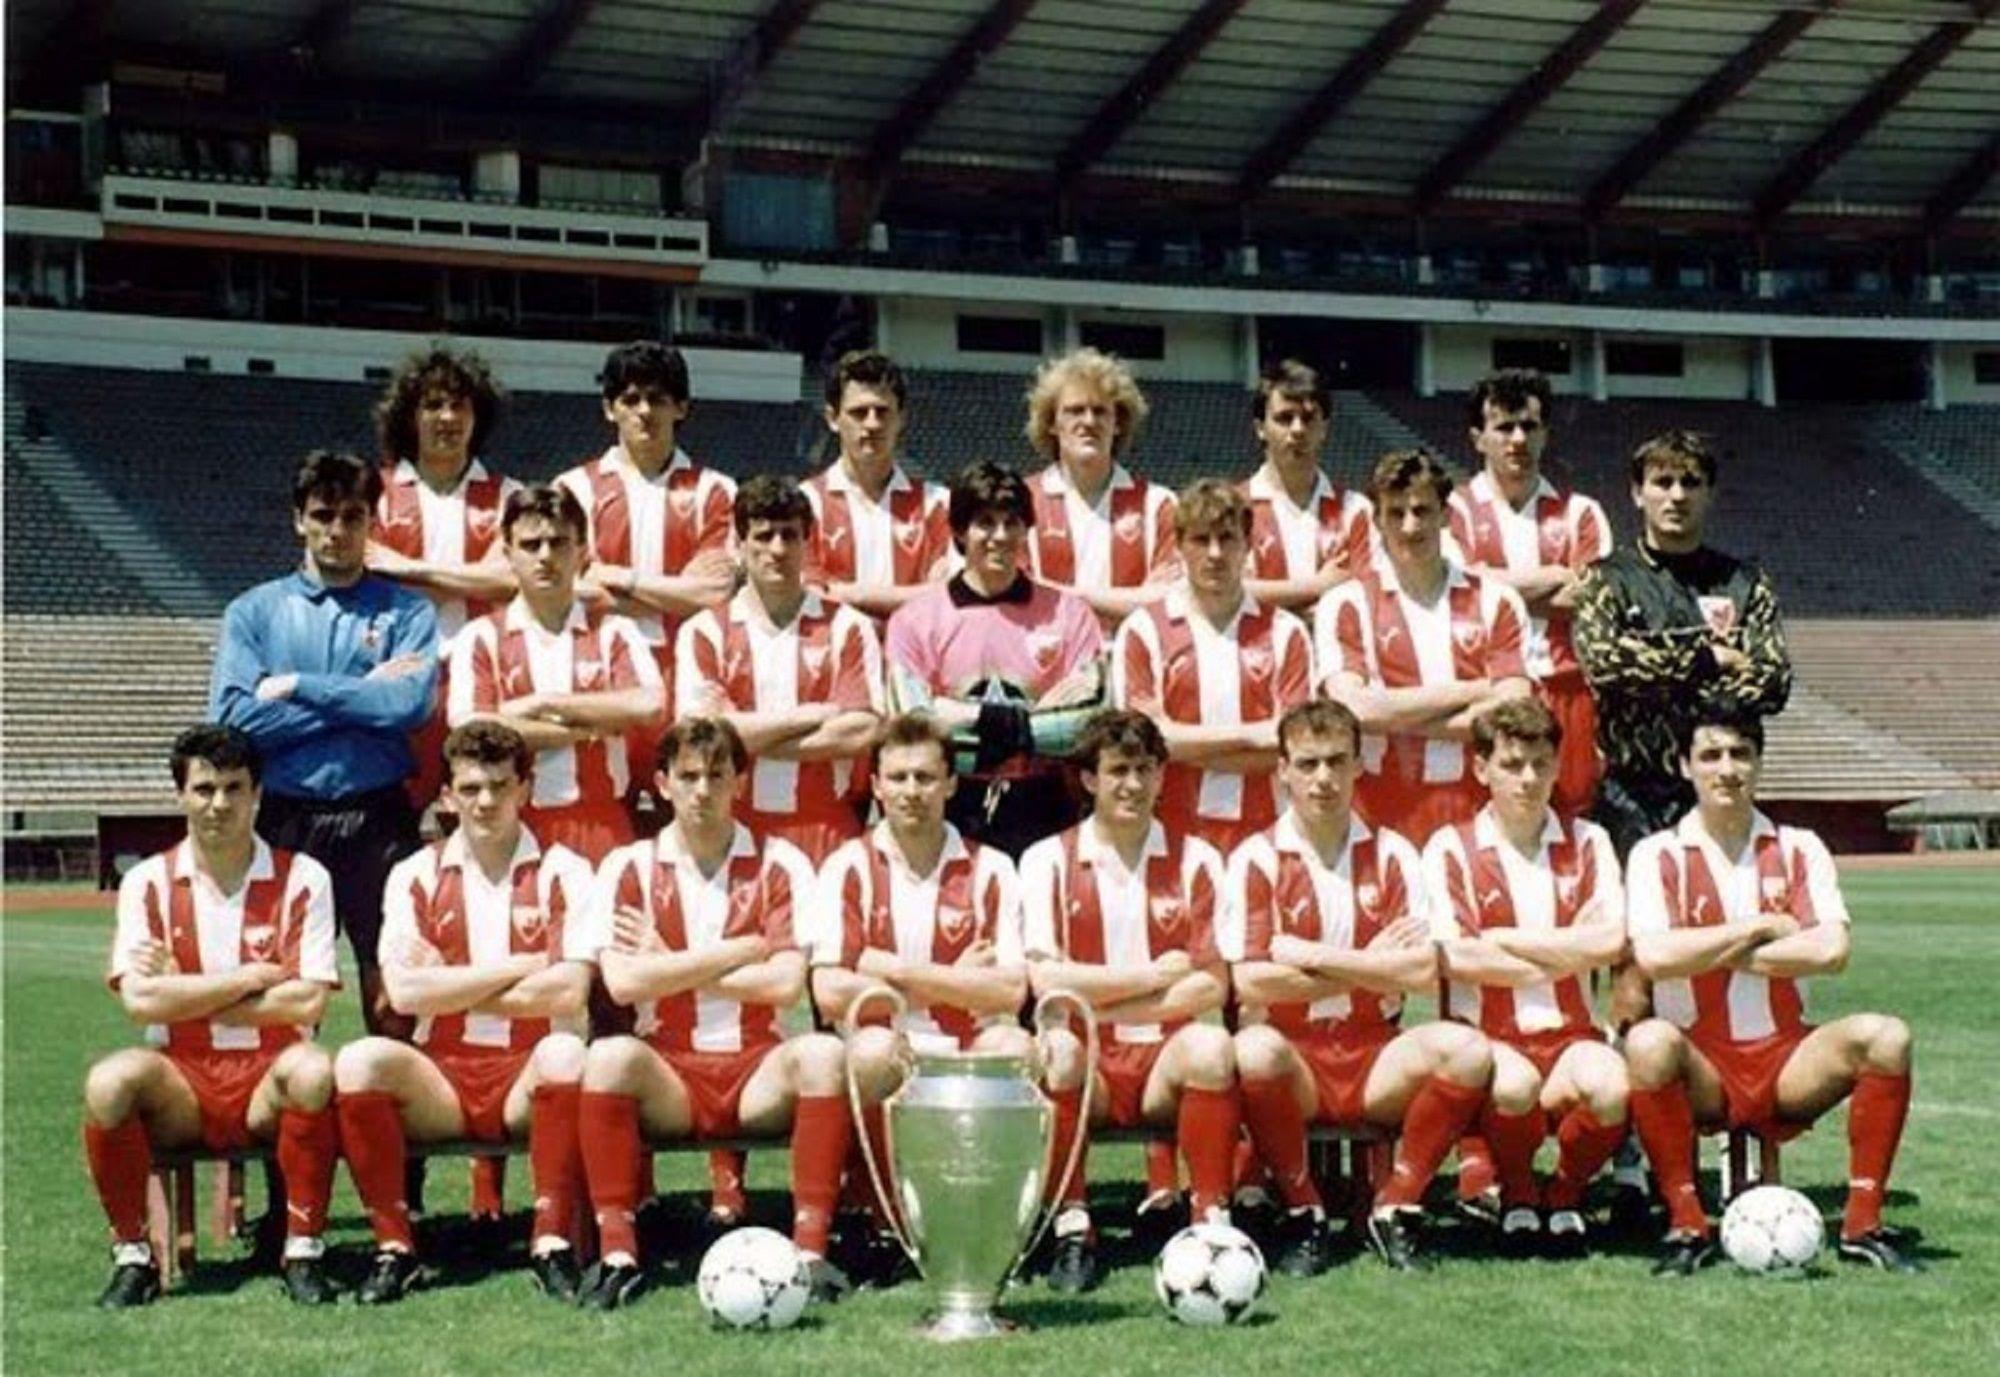 Estrella Roja De Belgrado Serbio Fudbalski Klub Crvena Zvezda Beograd Serbio Cirílico фудбалски клуб црвен Red Star Belgrade Vintage Football Football Club